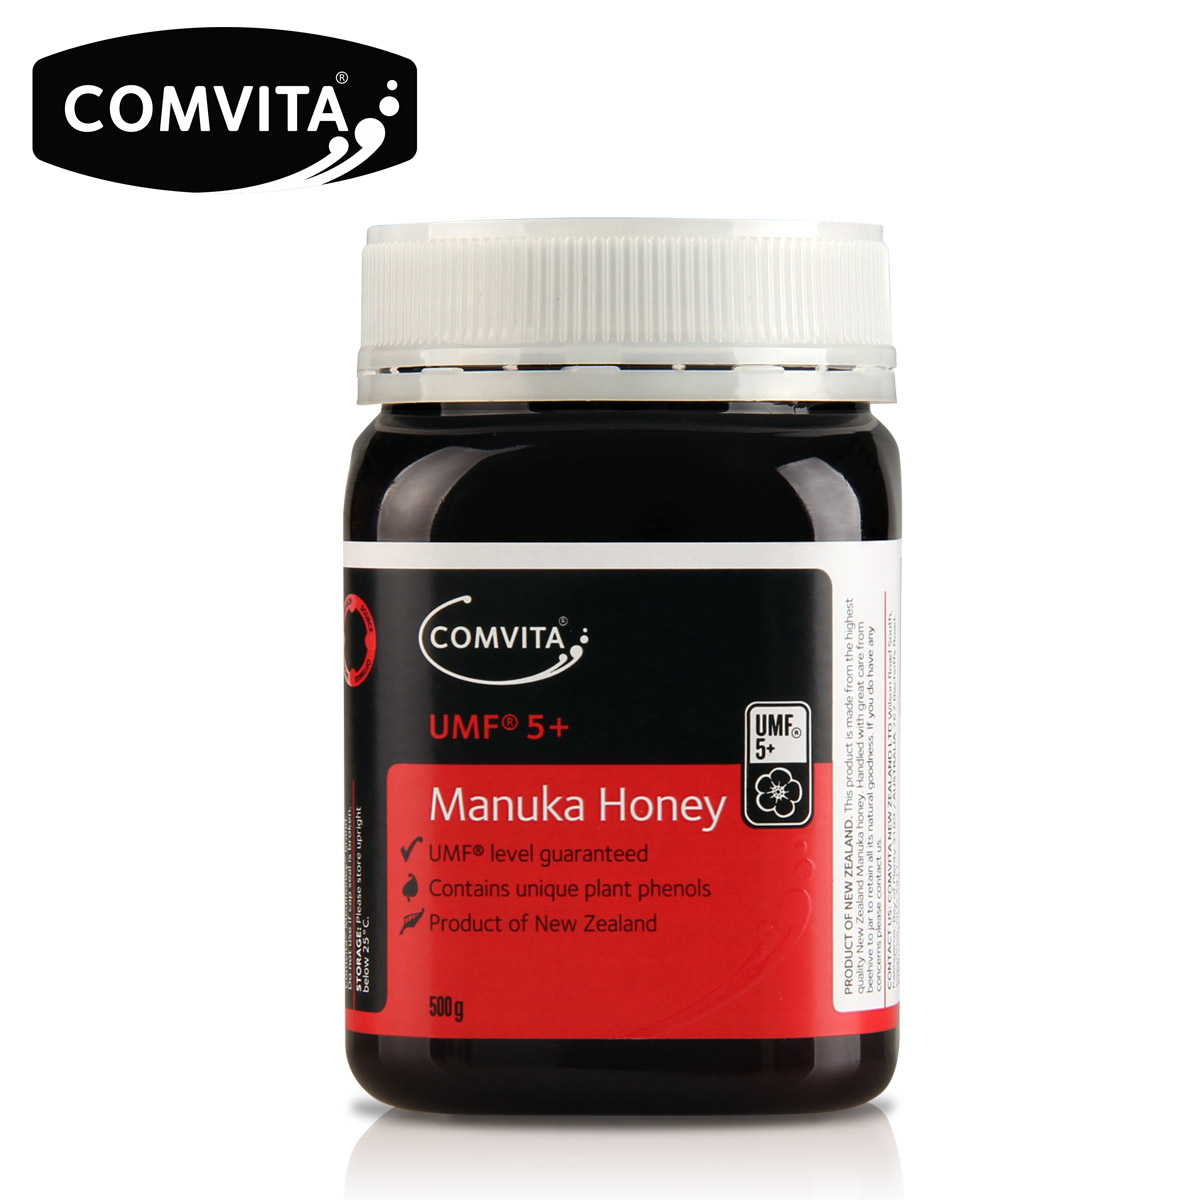 Comvita康维他 麦卢卡蜂蜜UMF5+ 500克